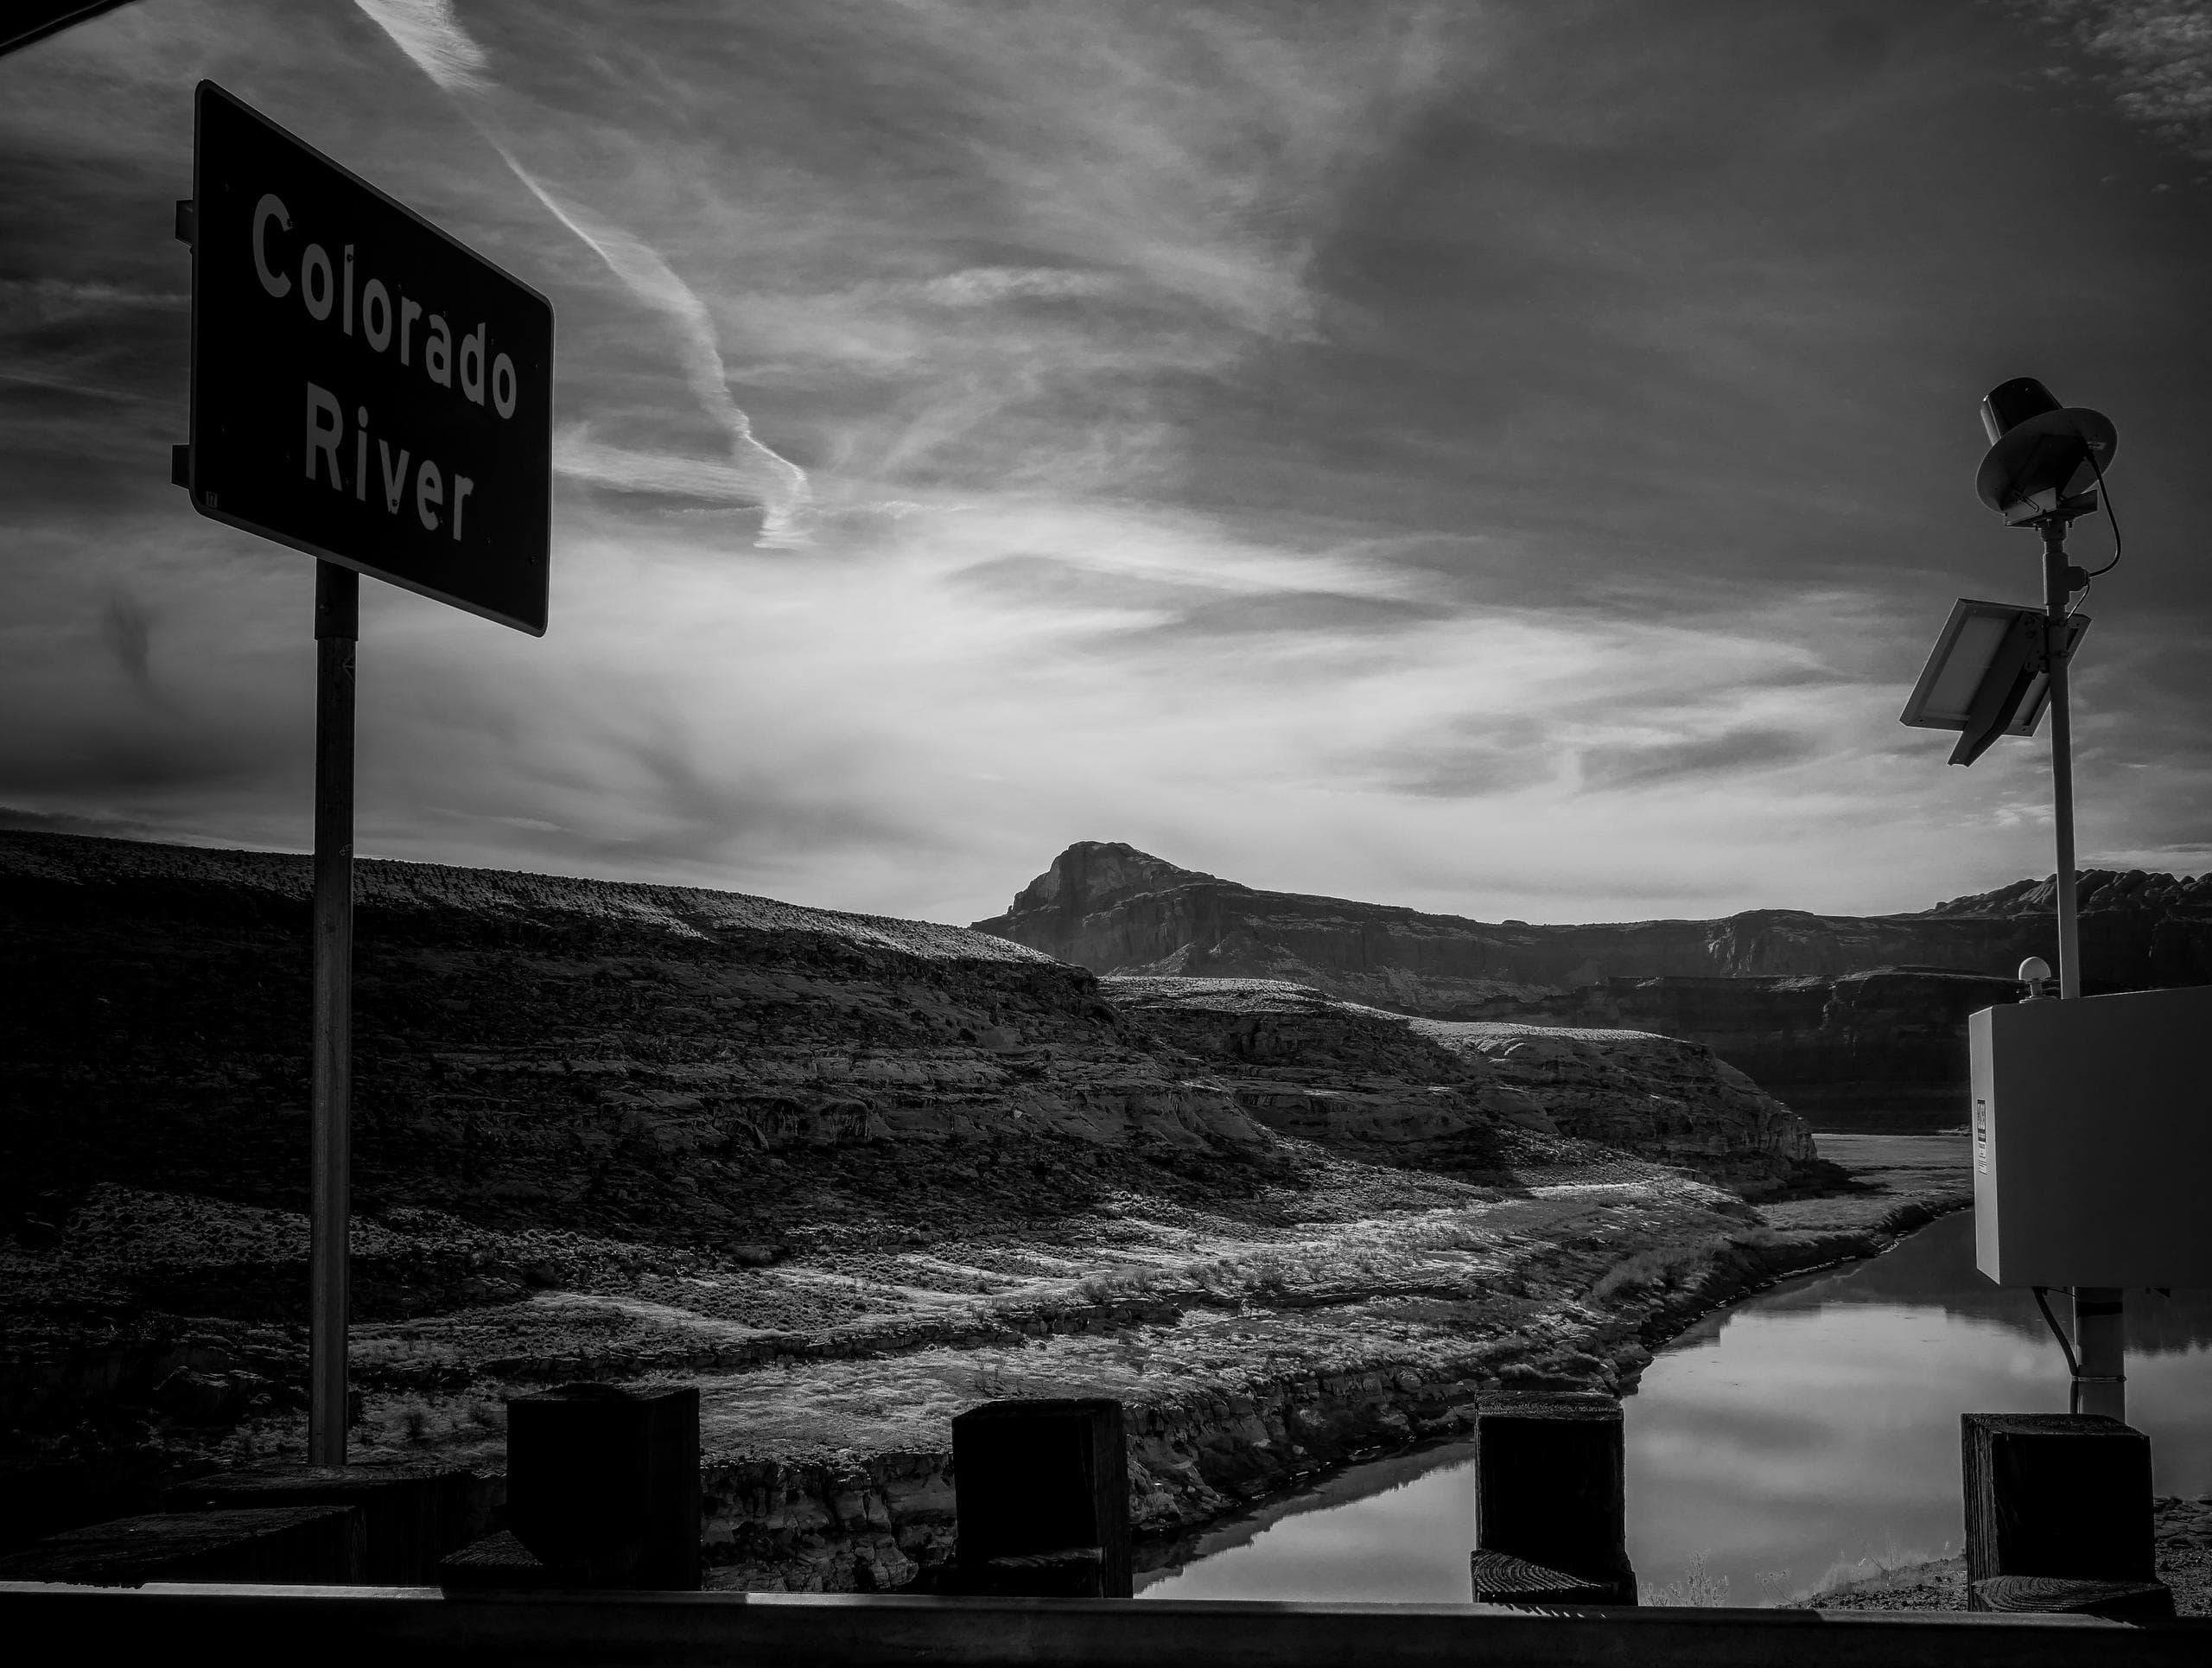 north wash into glen canyon